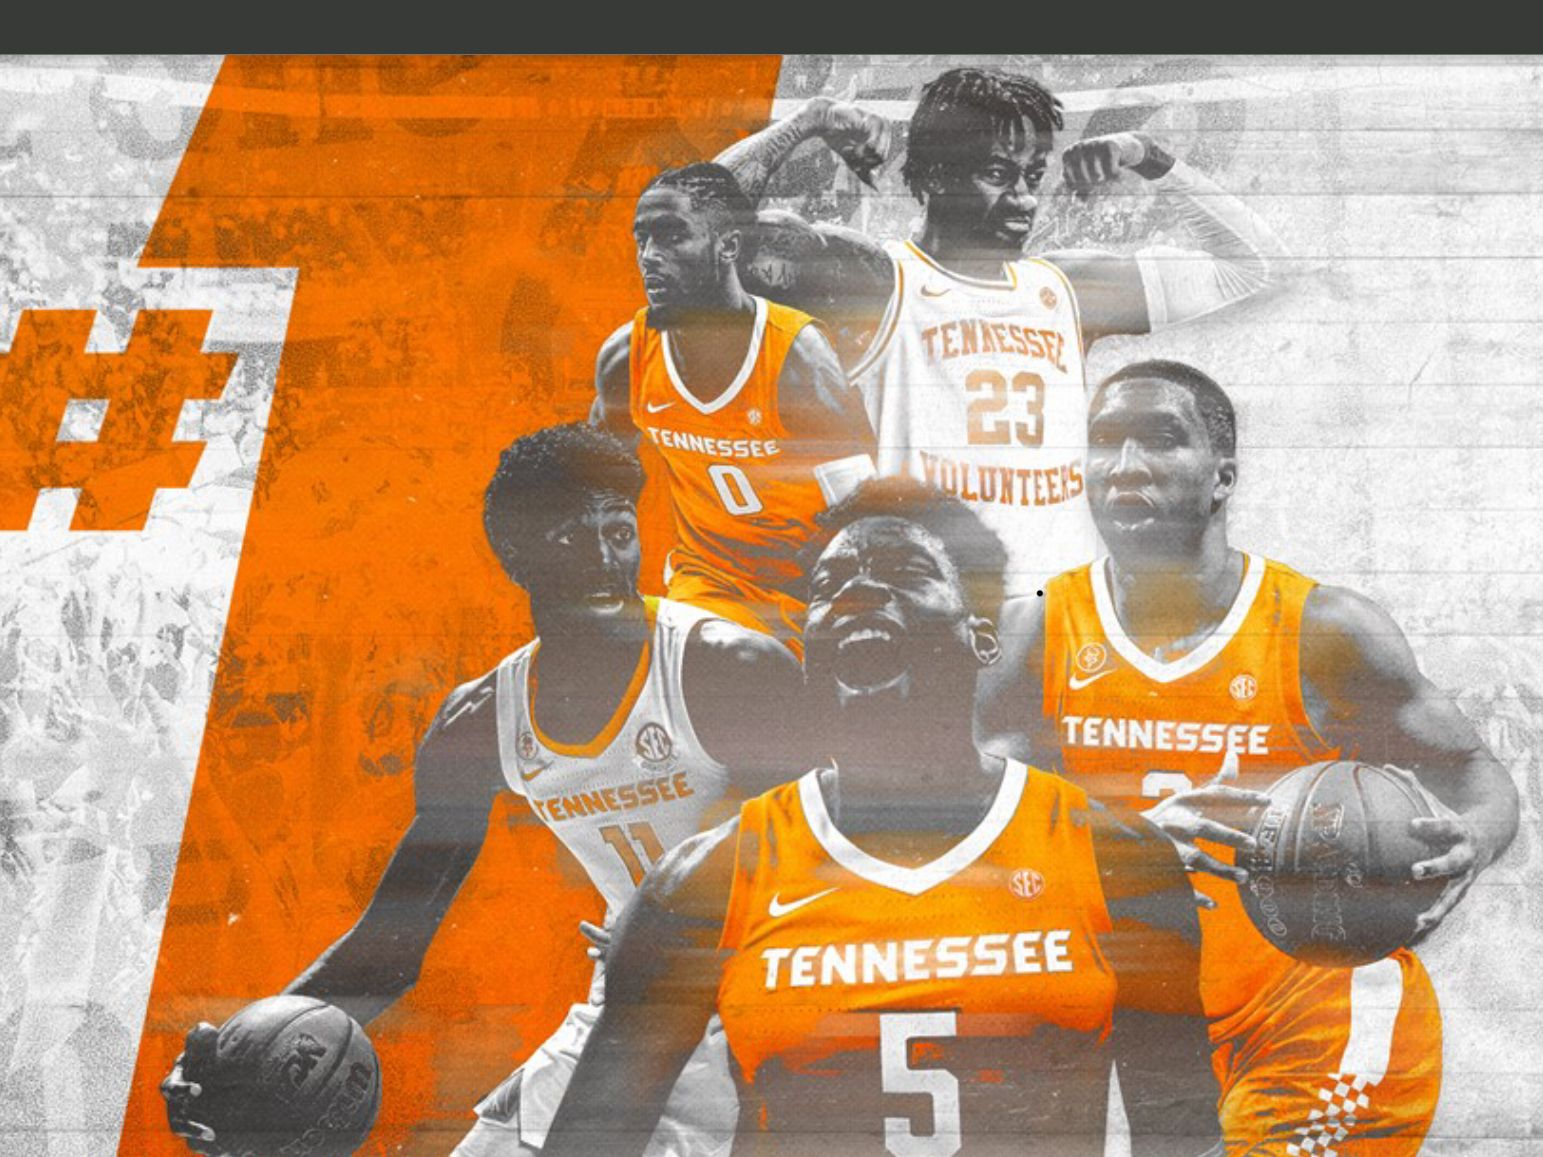 Georgia Tennessee Game 2019